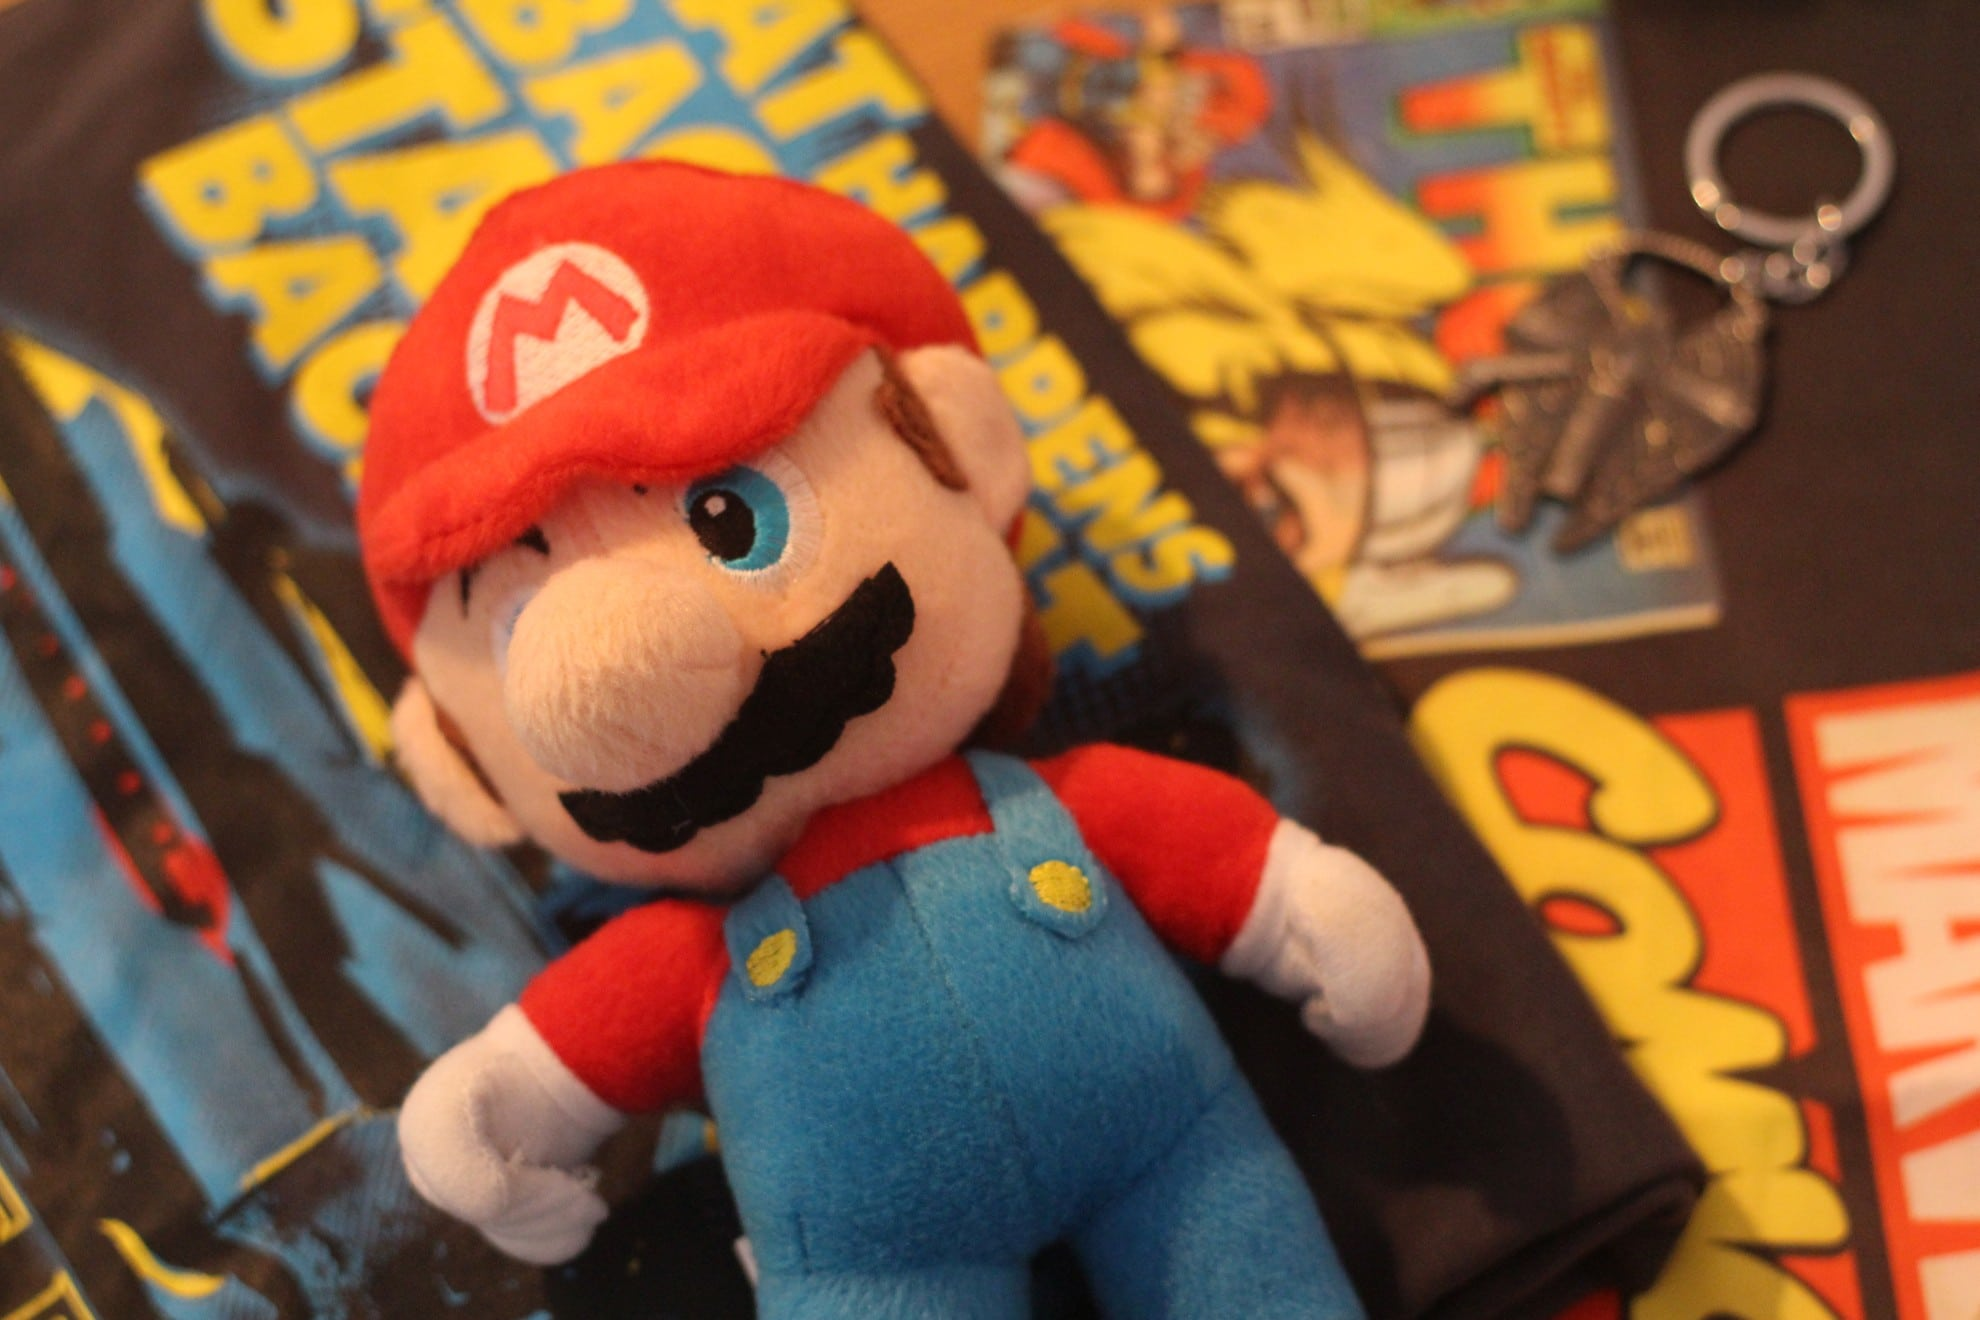 Mario und mehr. Das war in der ersten LootHood-Box. (Foto: GamingGadgets.de)